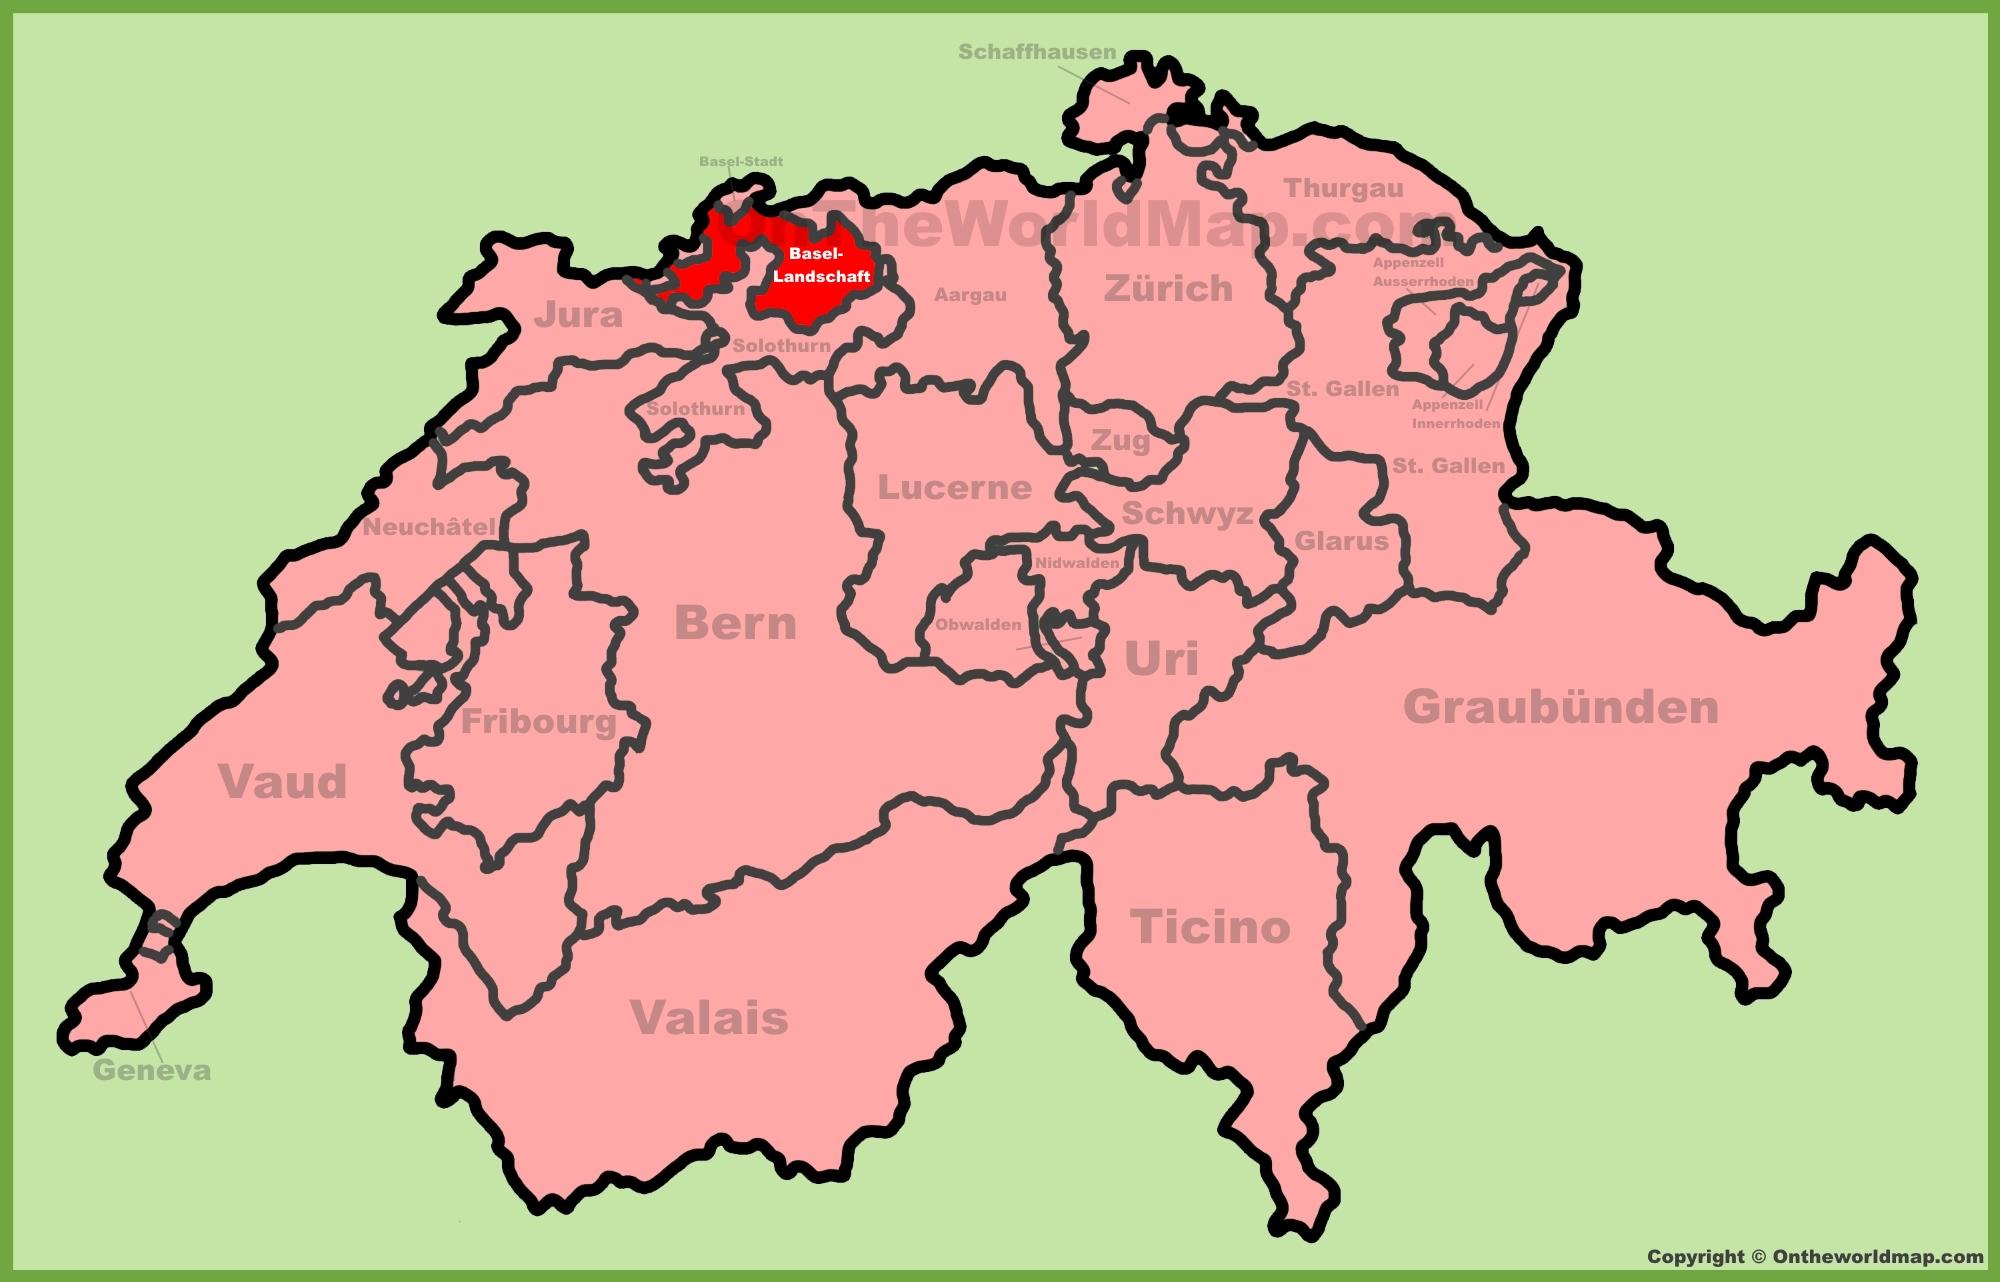 Basel Switzerland Map Canton of Basel Landschaft Maps | Switzerland | Maps of Canton of